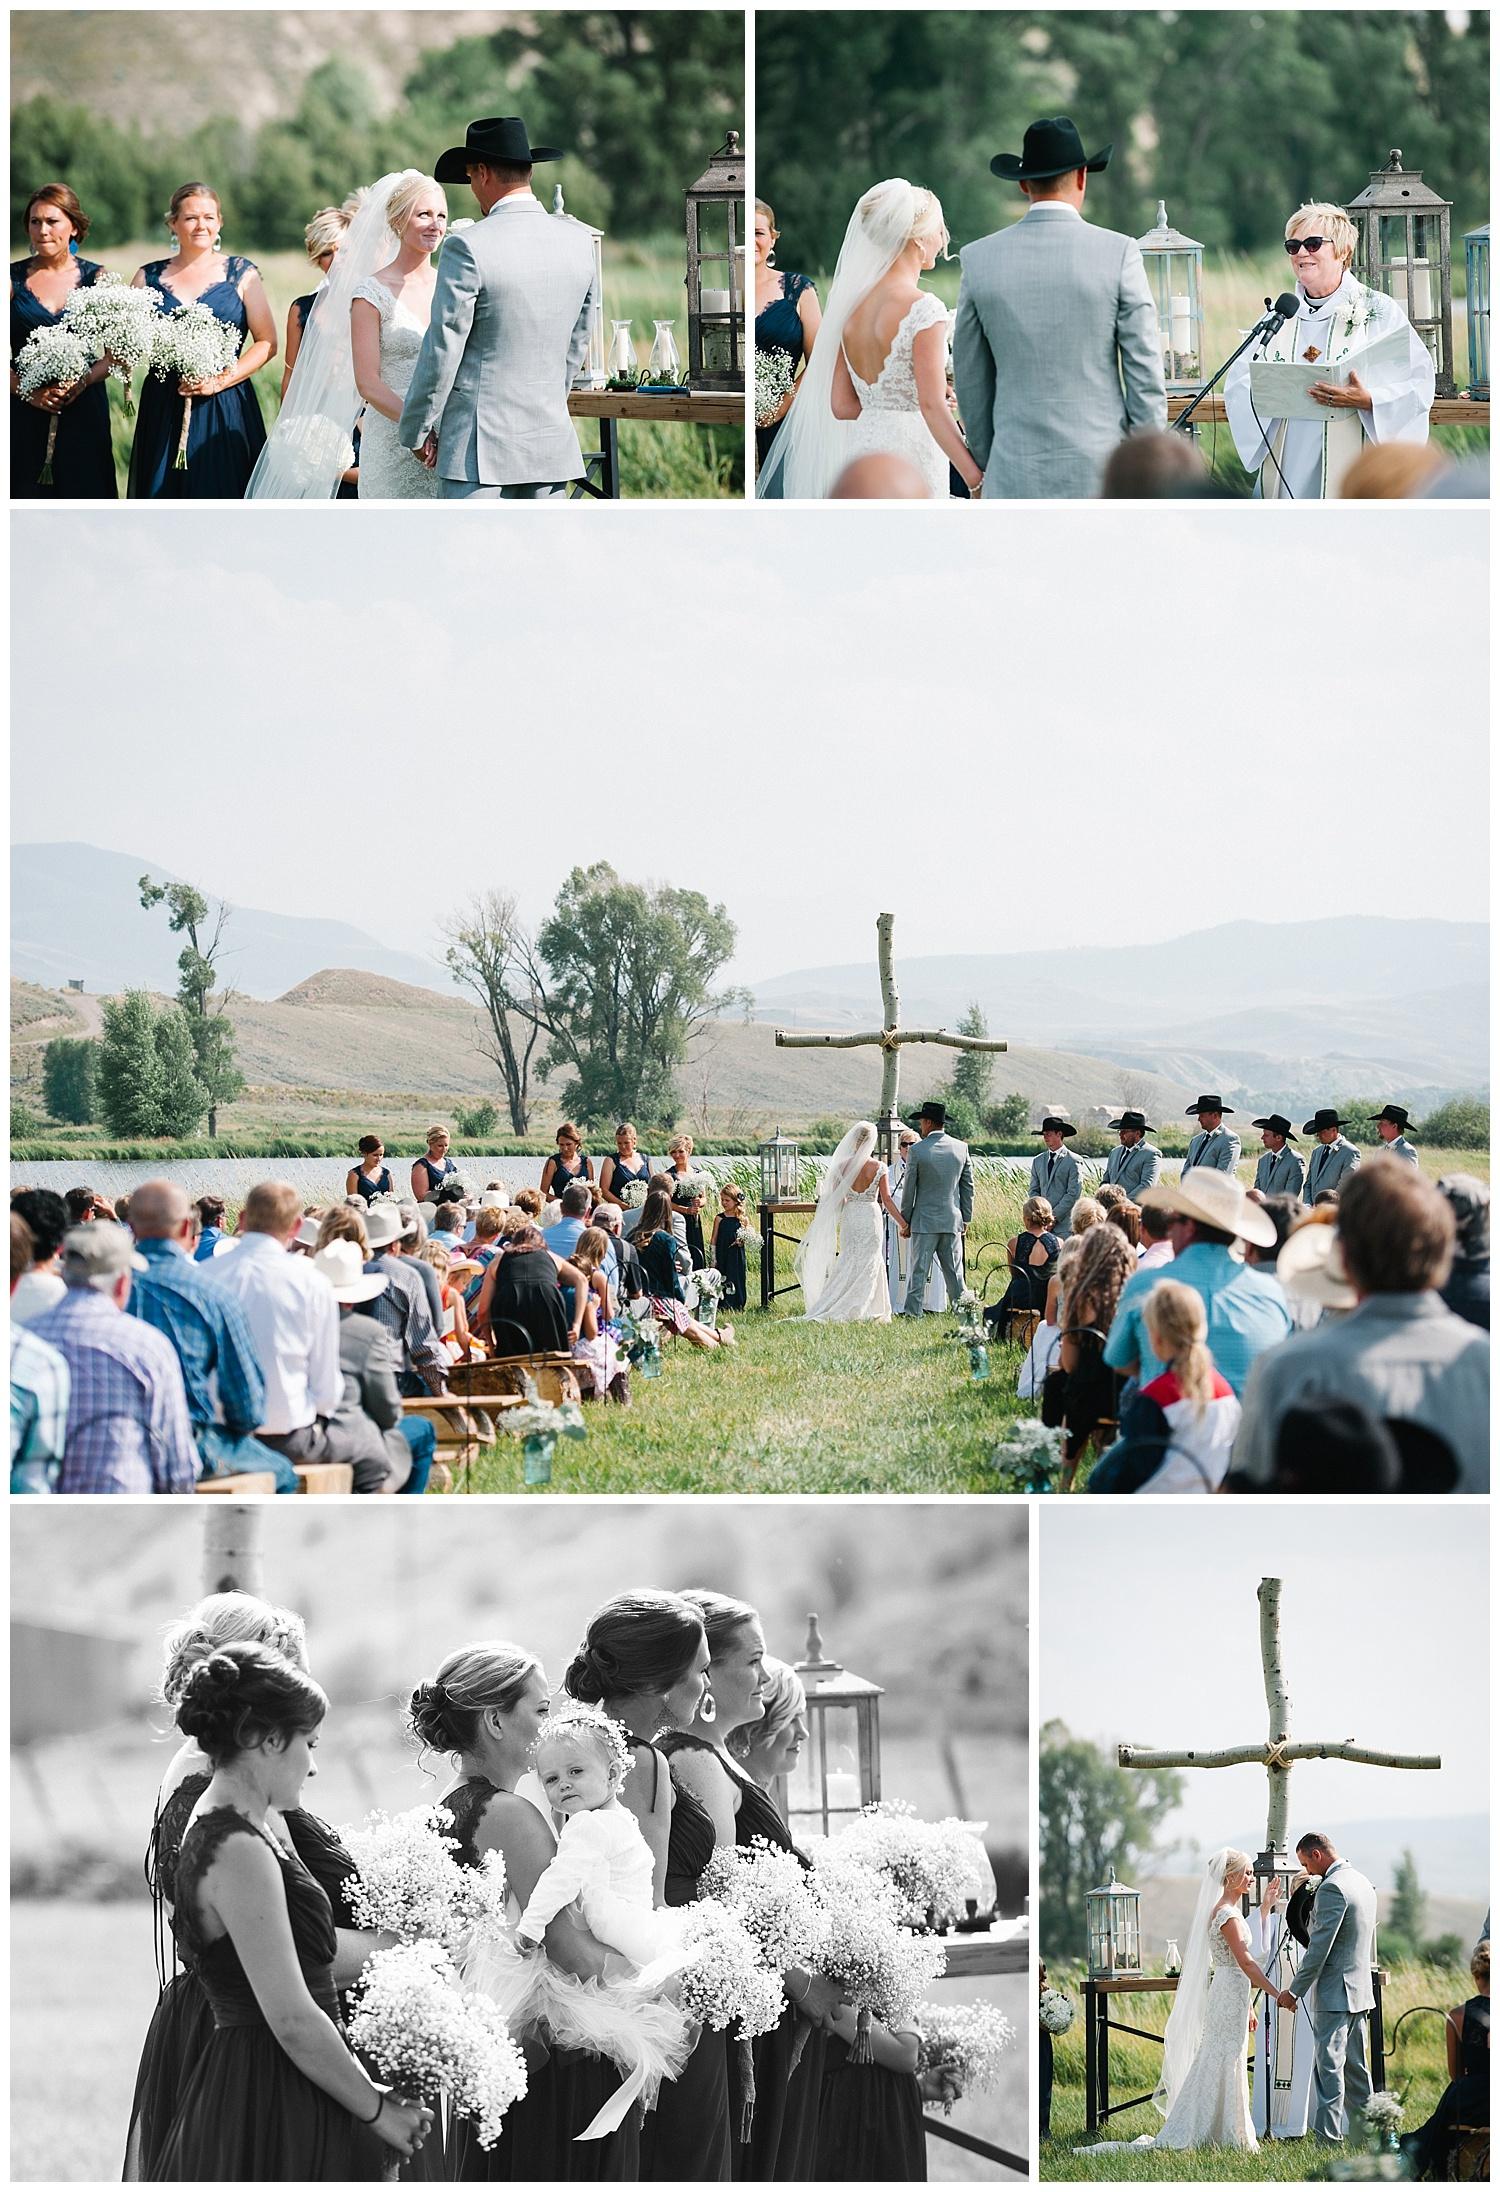 Kremmling CO Ranch Wedding by Caitlin Steuben Photography5.jpg